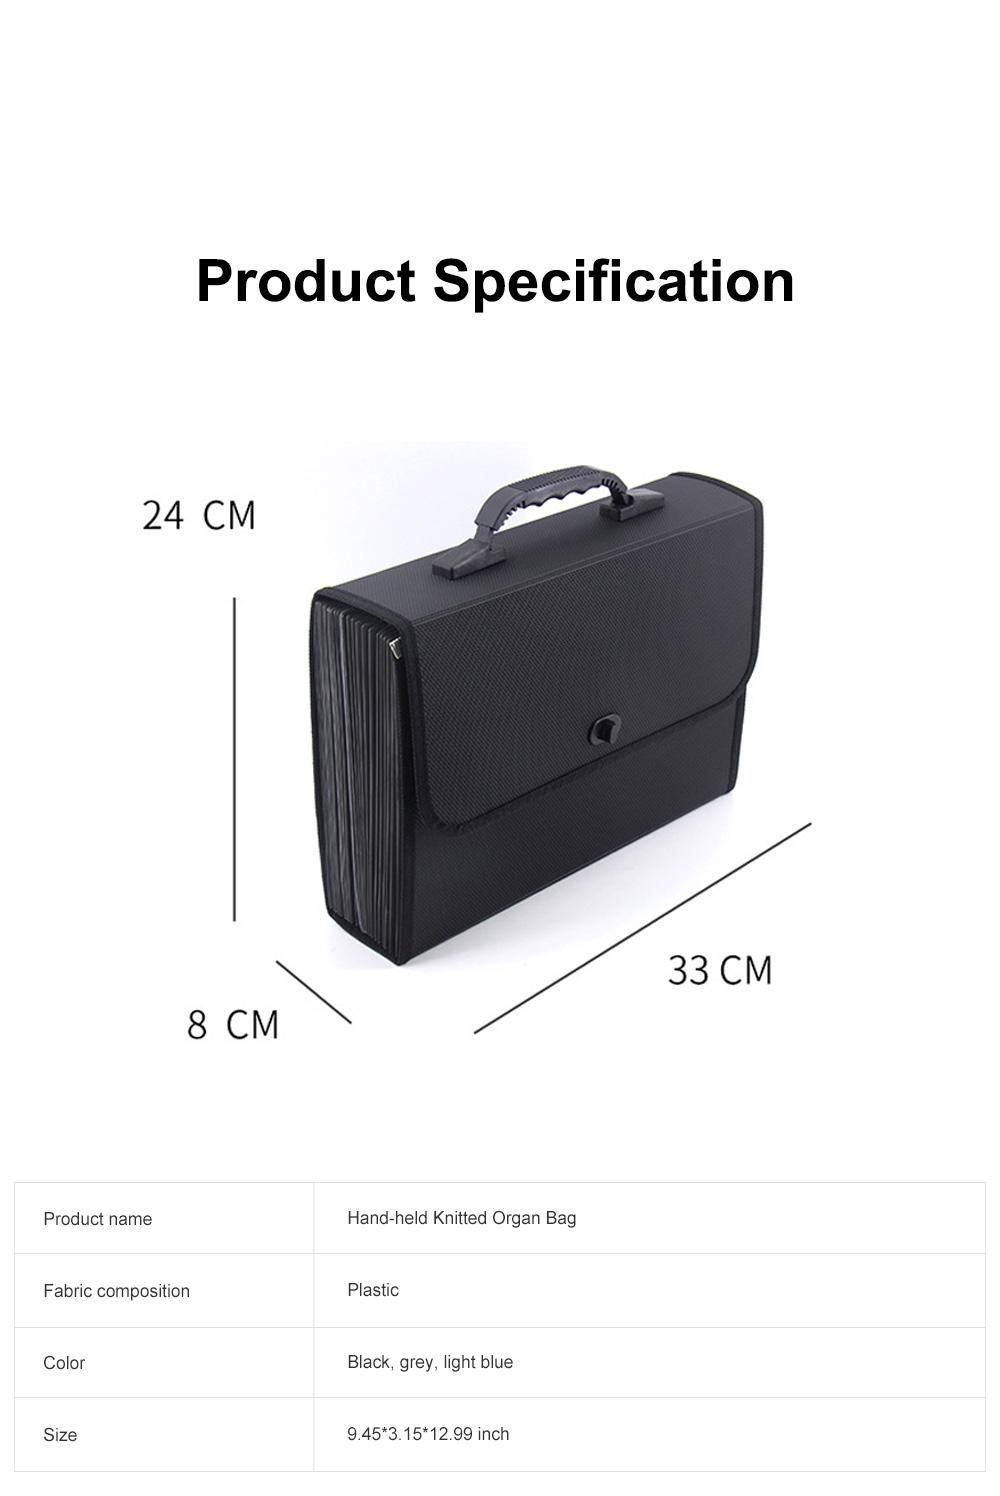 Portable Hand-held Knitted Organ Bag 26-tier Multi-tier Folders Office File Bag Paper File Bag 6